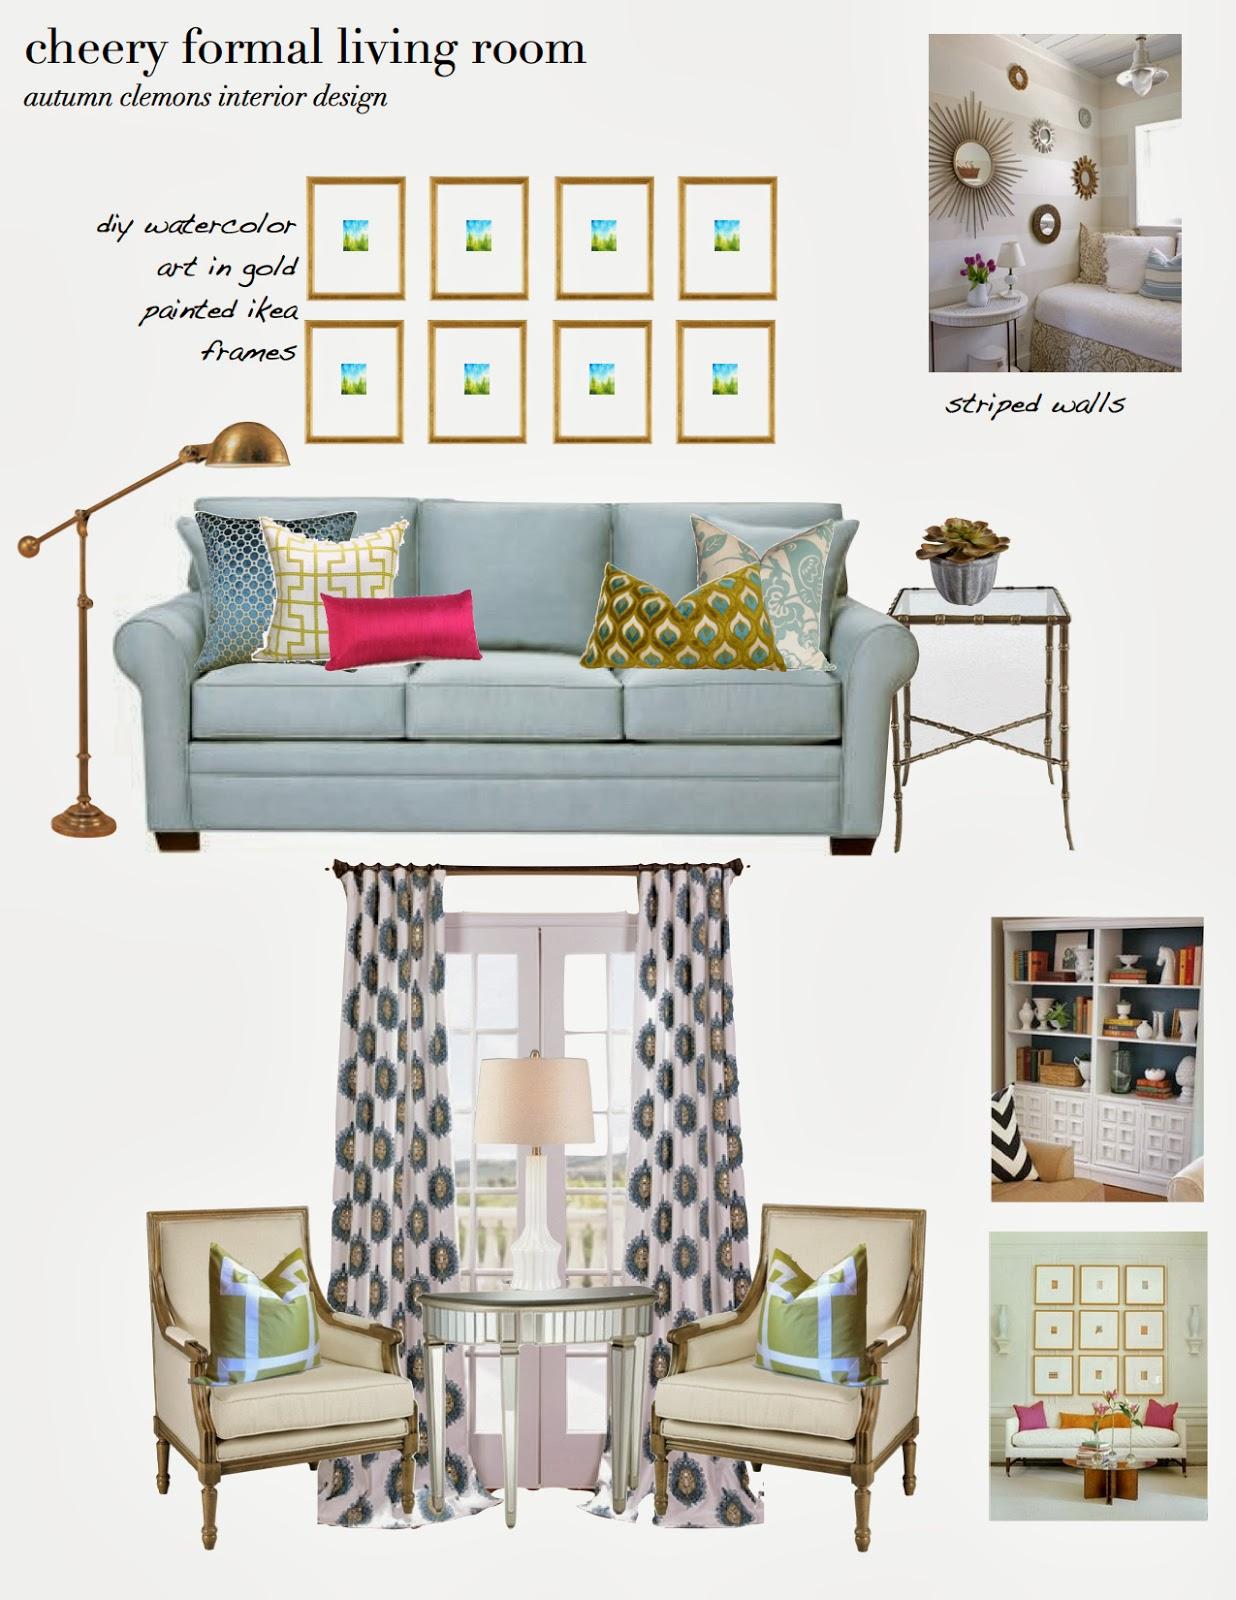 Room Design Program: Design Dump: Design Plan: Cheery Formal Living Room